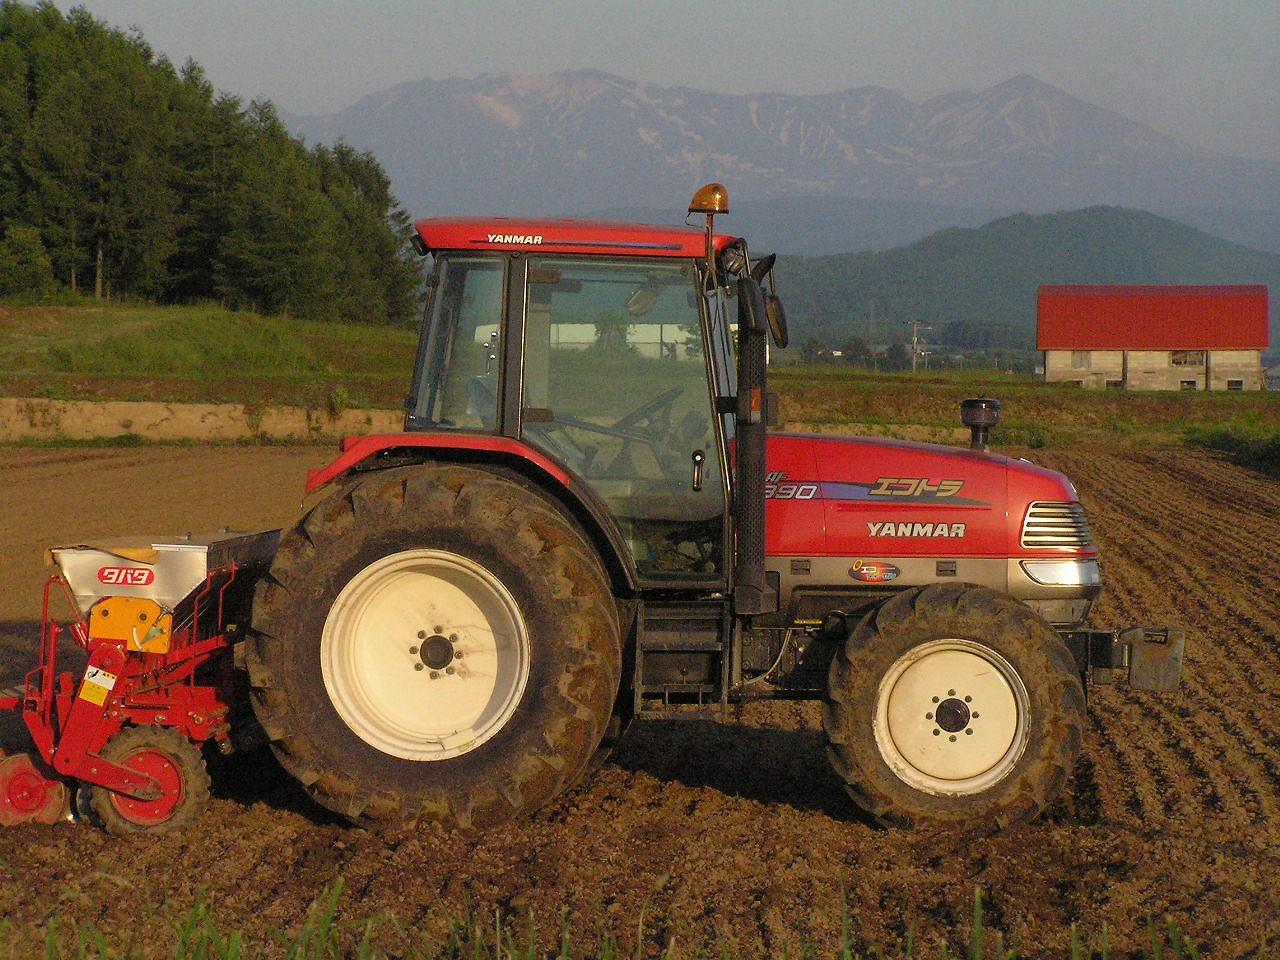 list of yanmar tractors tractor construction plant wiki fandom rh tractors wikia com Problem Models Yanmar Compact Tractors Yanmar Tractor Parts